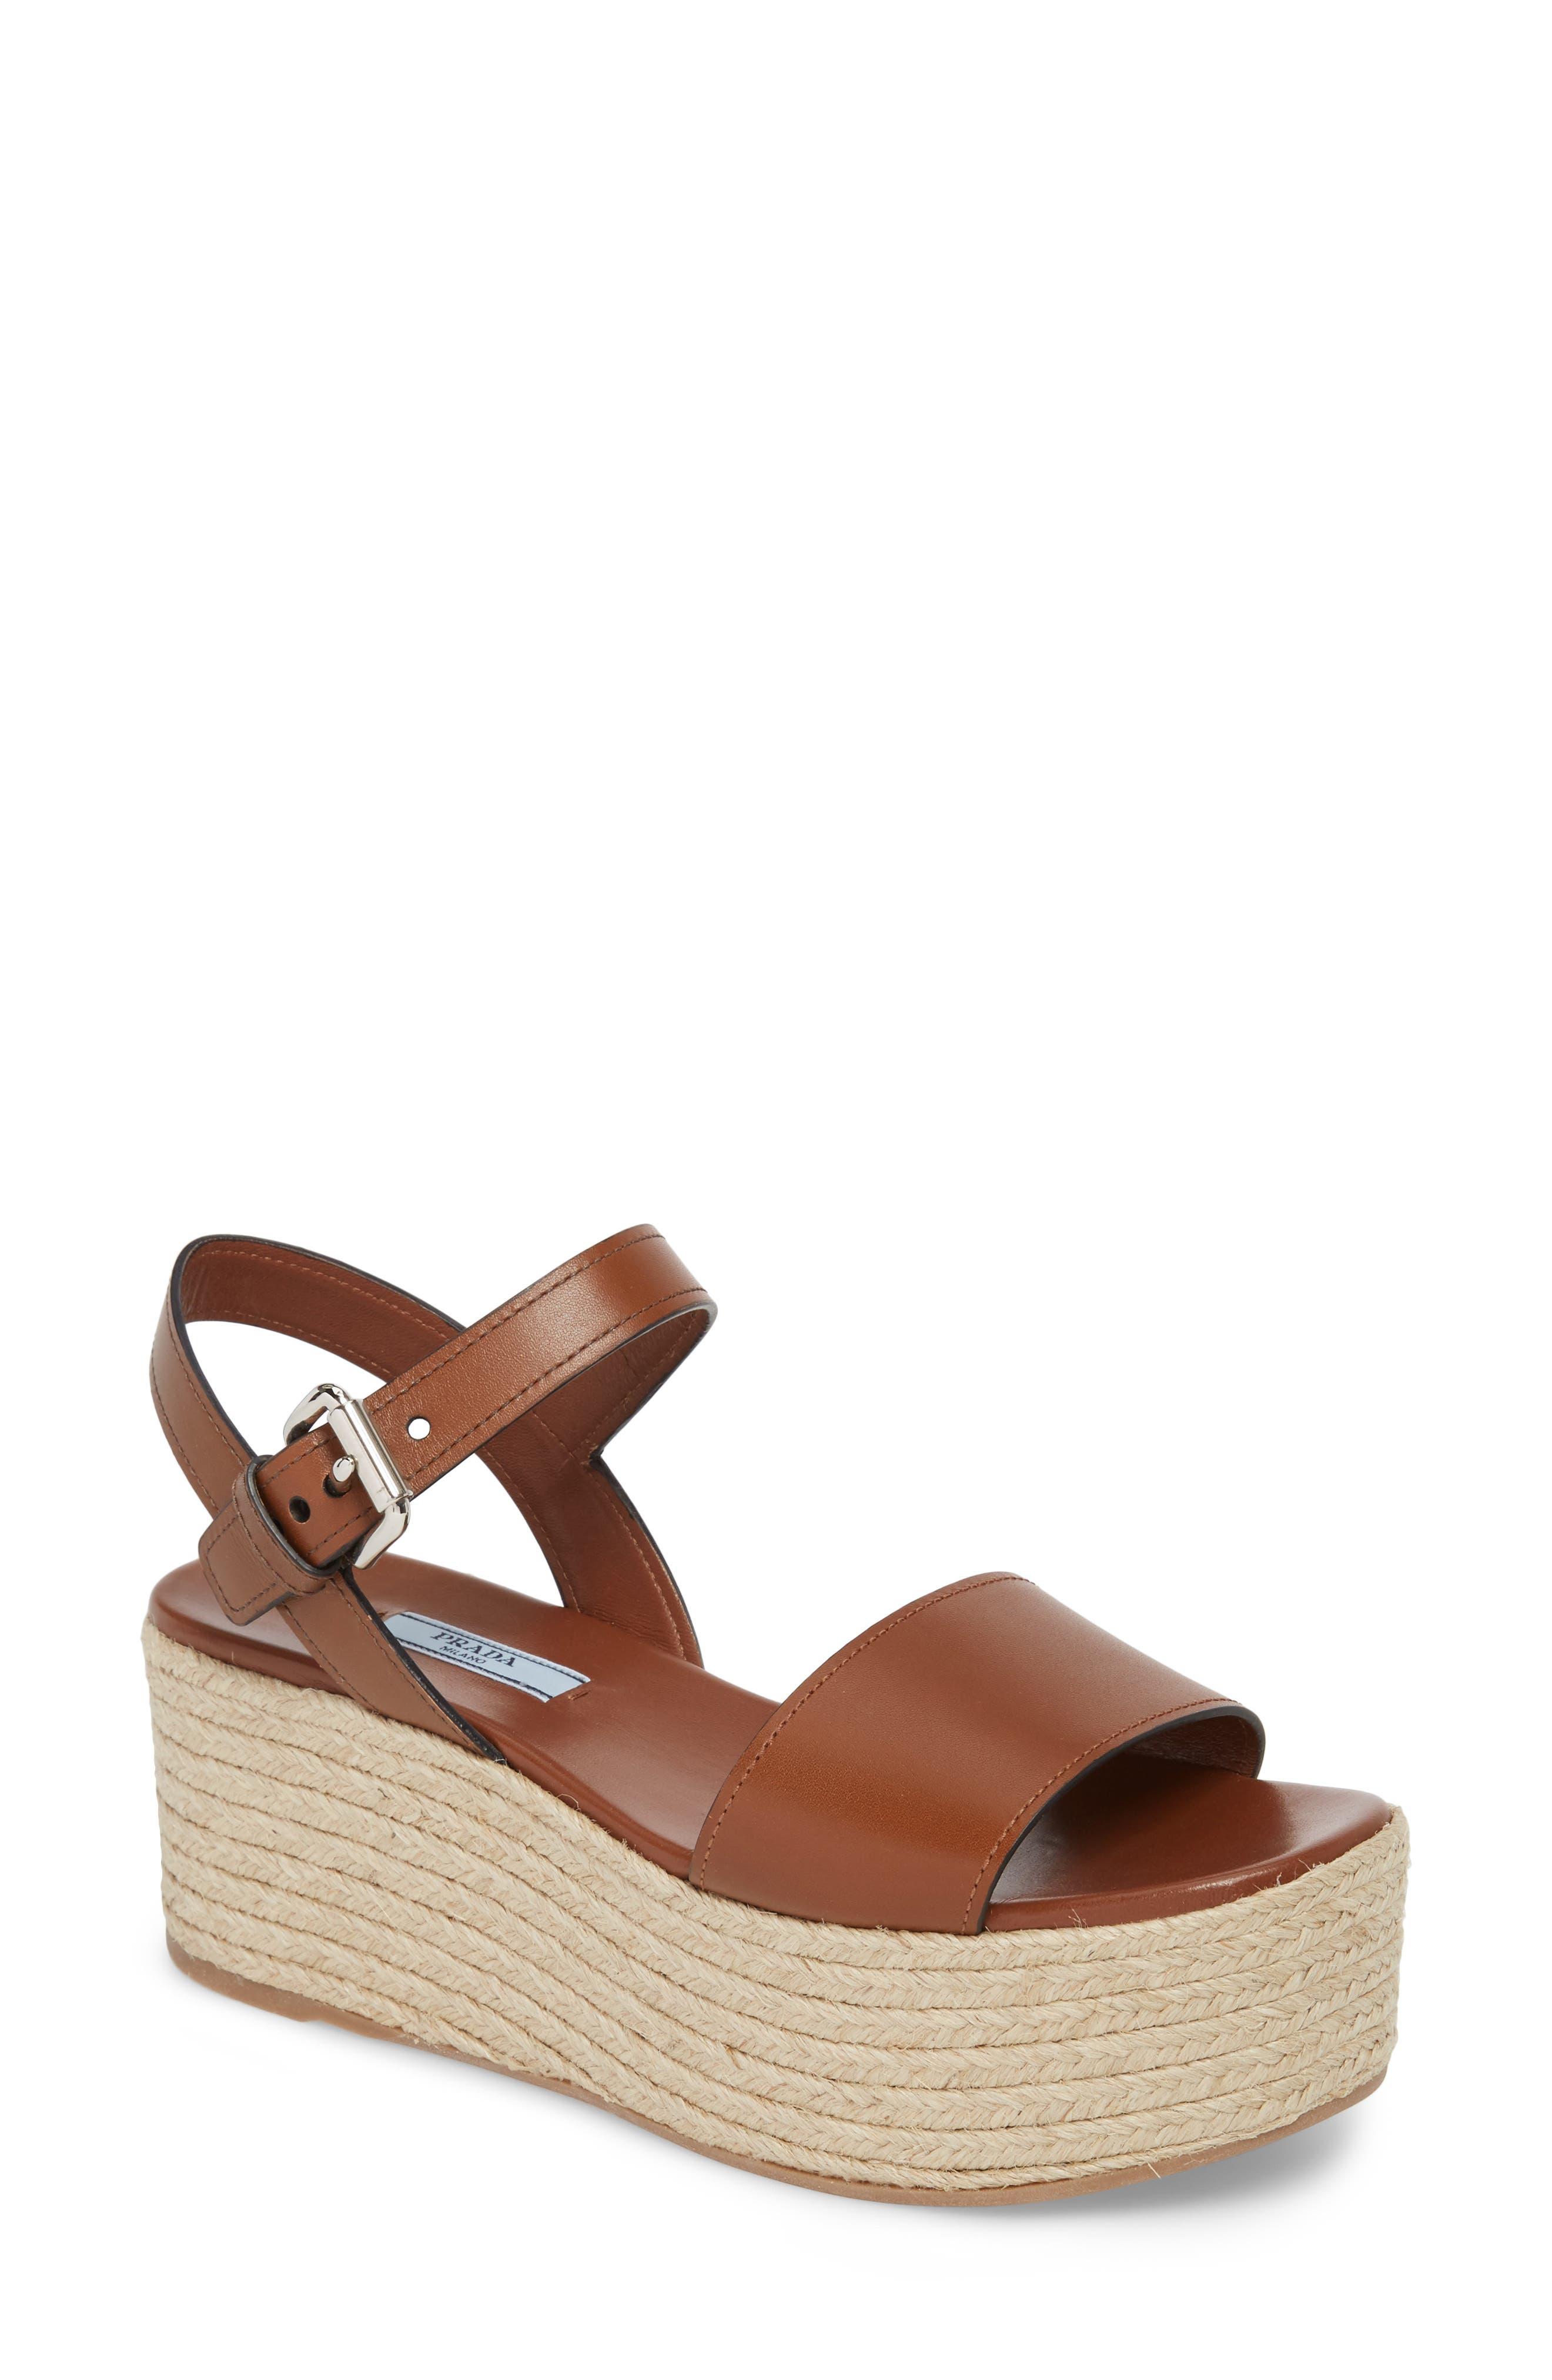 Alternate Image 1 Selected - Prada Platform Espadrille Sandal (Women)